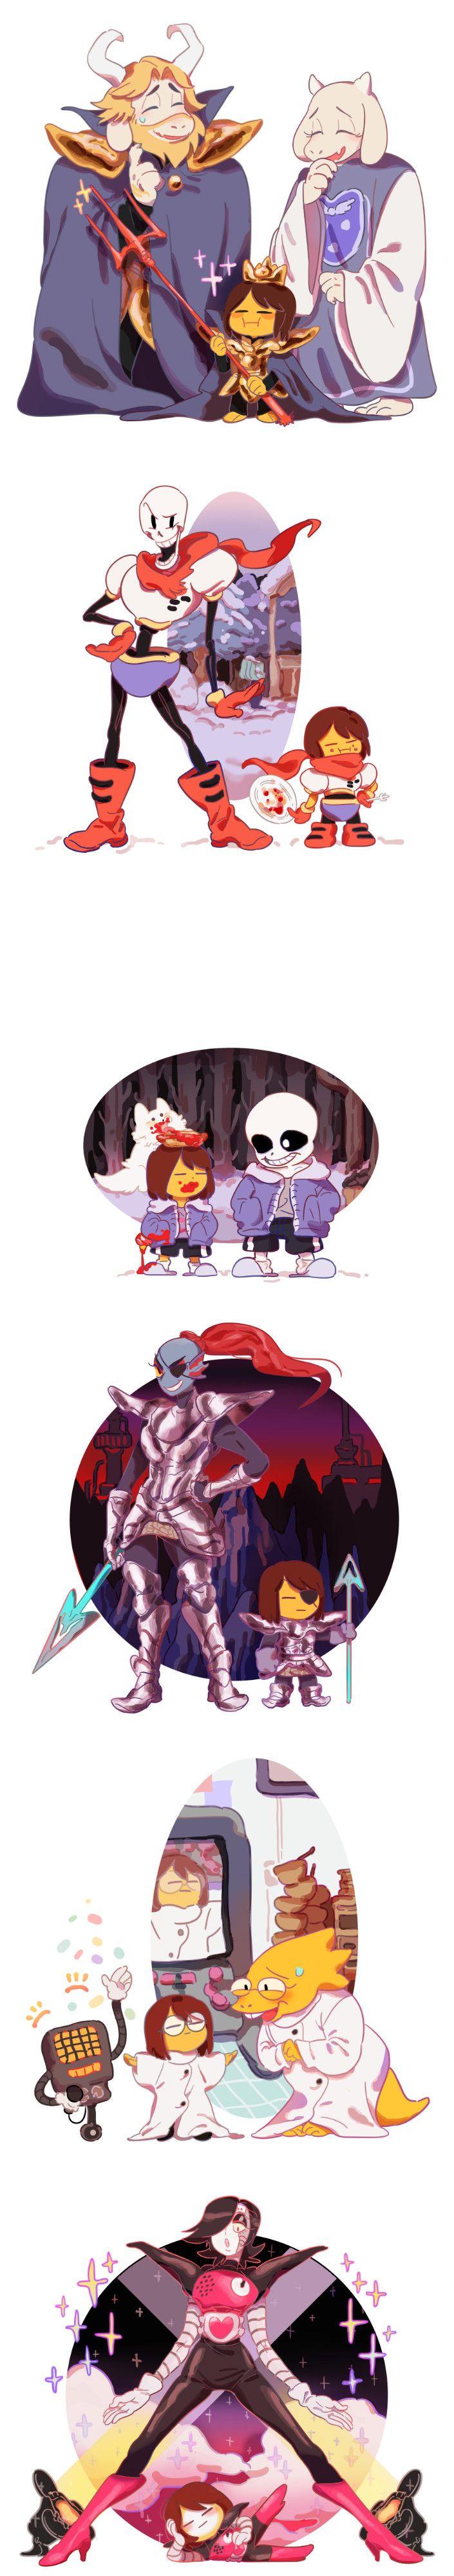 Frisk with Asgore, Toriel, Papyrus, Sans, Undyne, Alphys, and Mettaton - http://mel12da.tumblr.com/post/133544175515/new-little-king-skull-friend-great-hero-dr